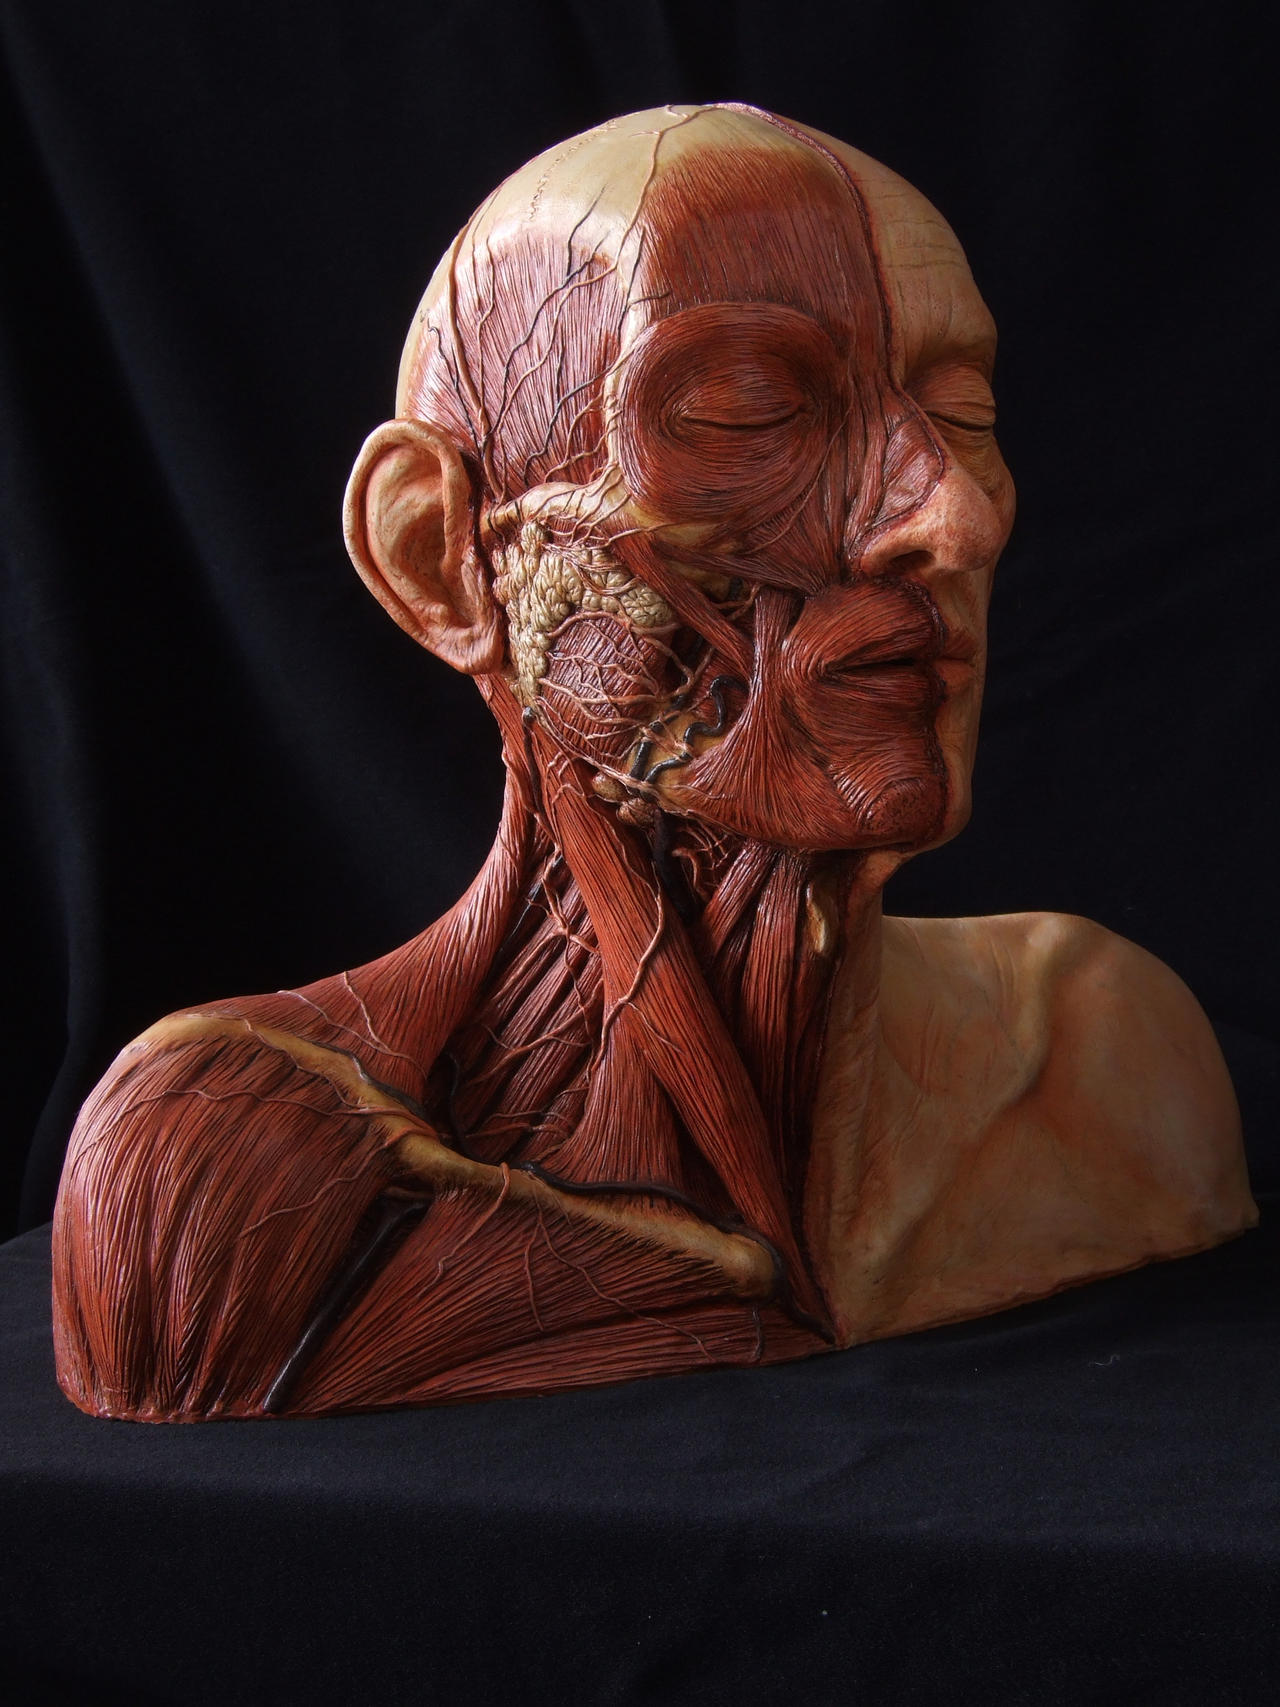 Anatomy Study - Human head by revenant-99 on DeviantArt